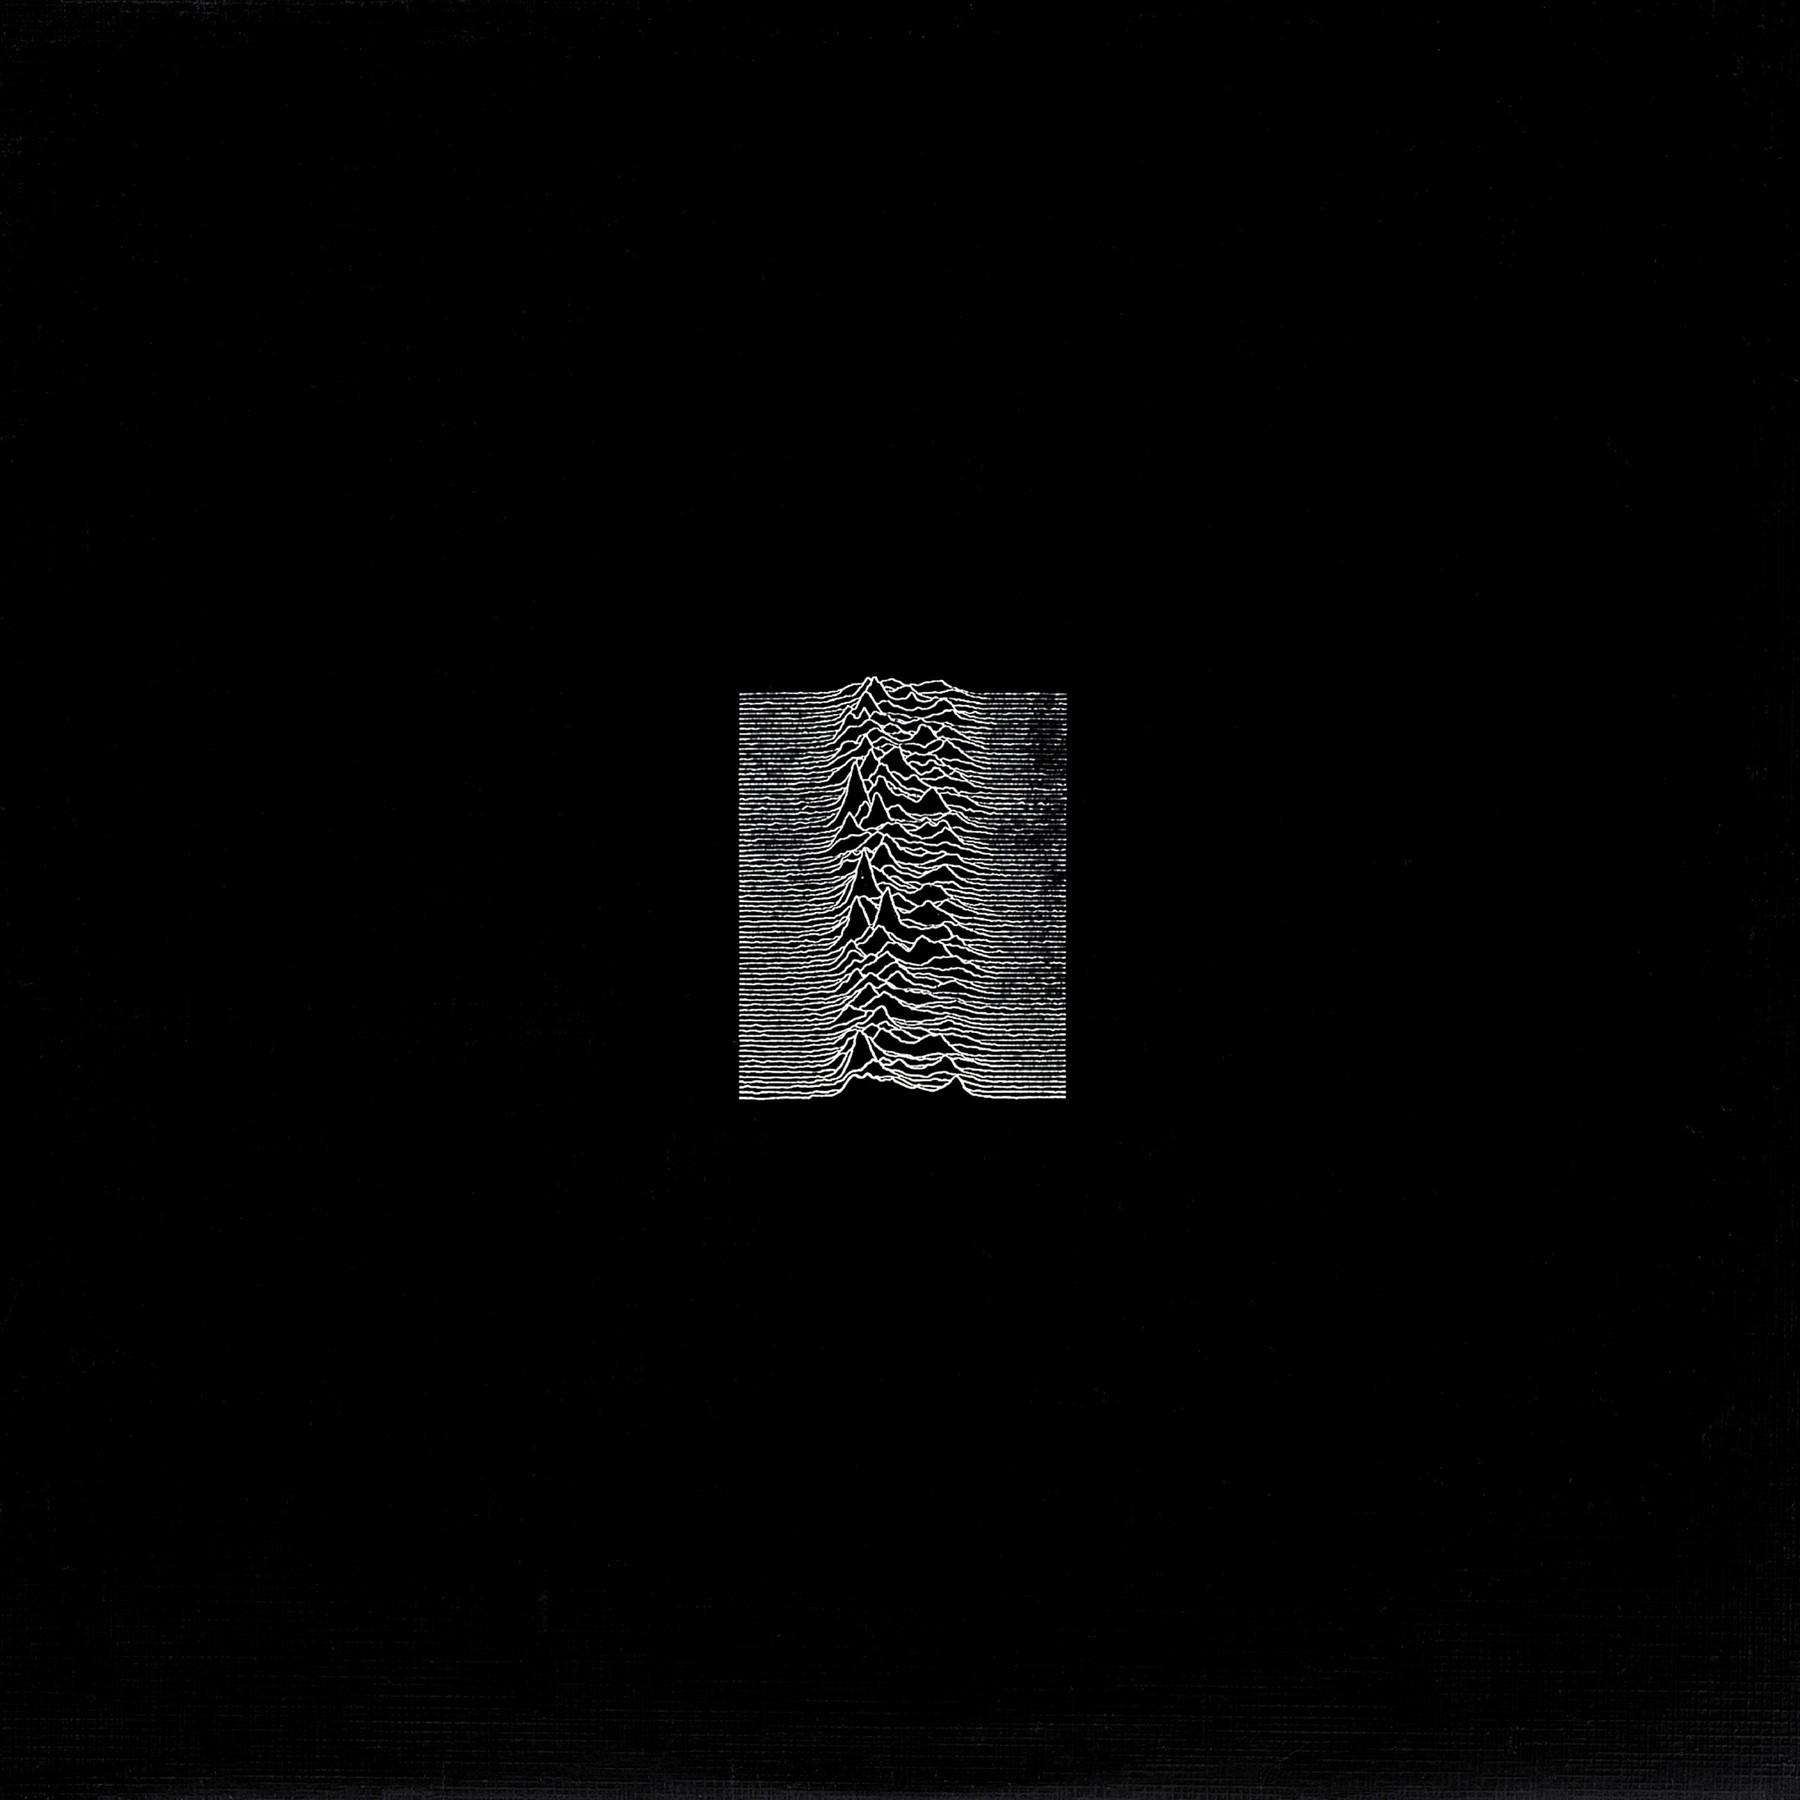 peter-saville-unknown-pleasures-joy-division-album-cover_dezeen_sq.jpg